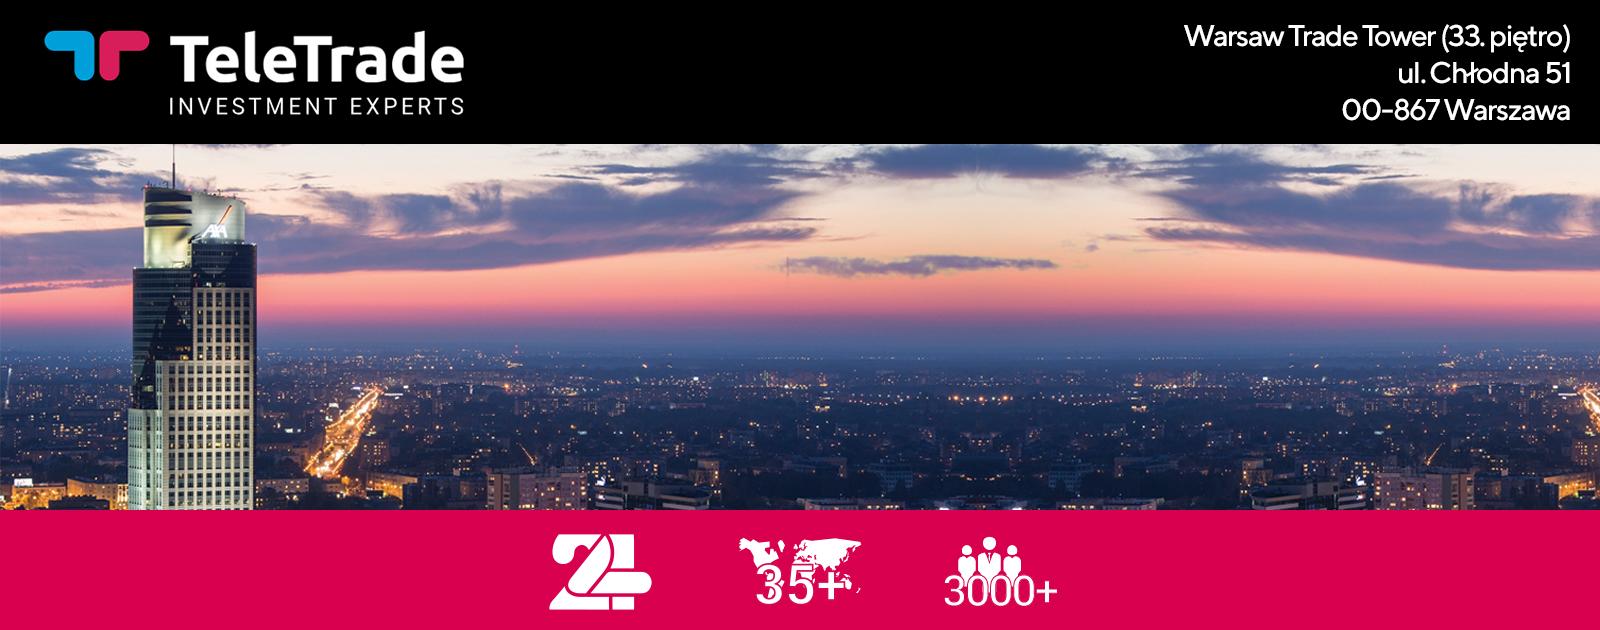 TeleTrade Polska